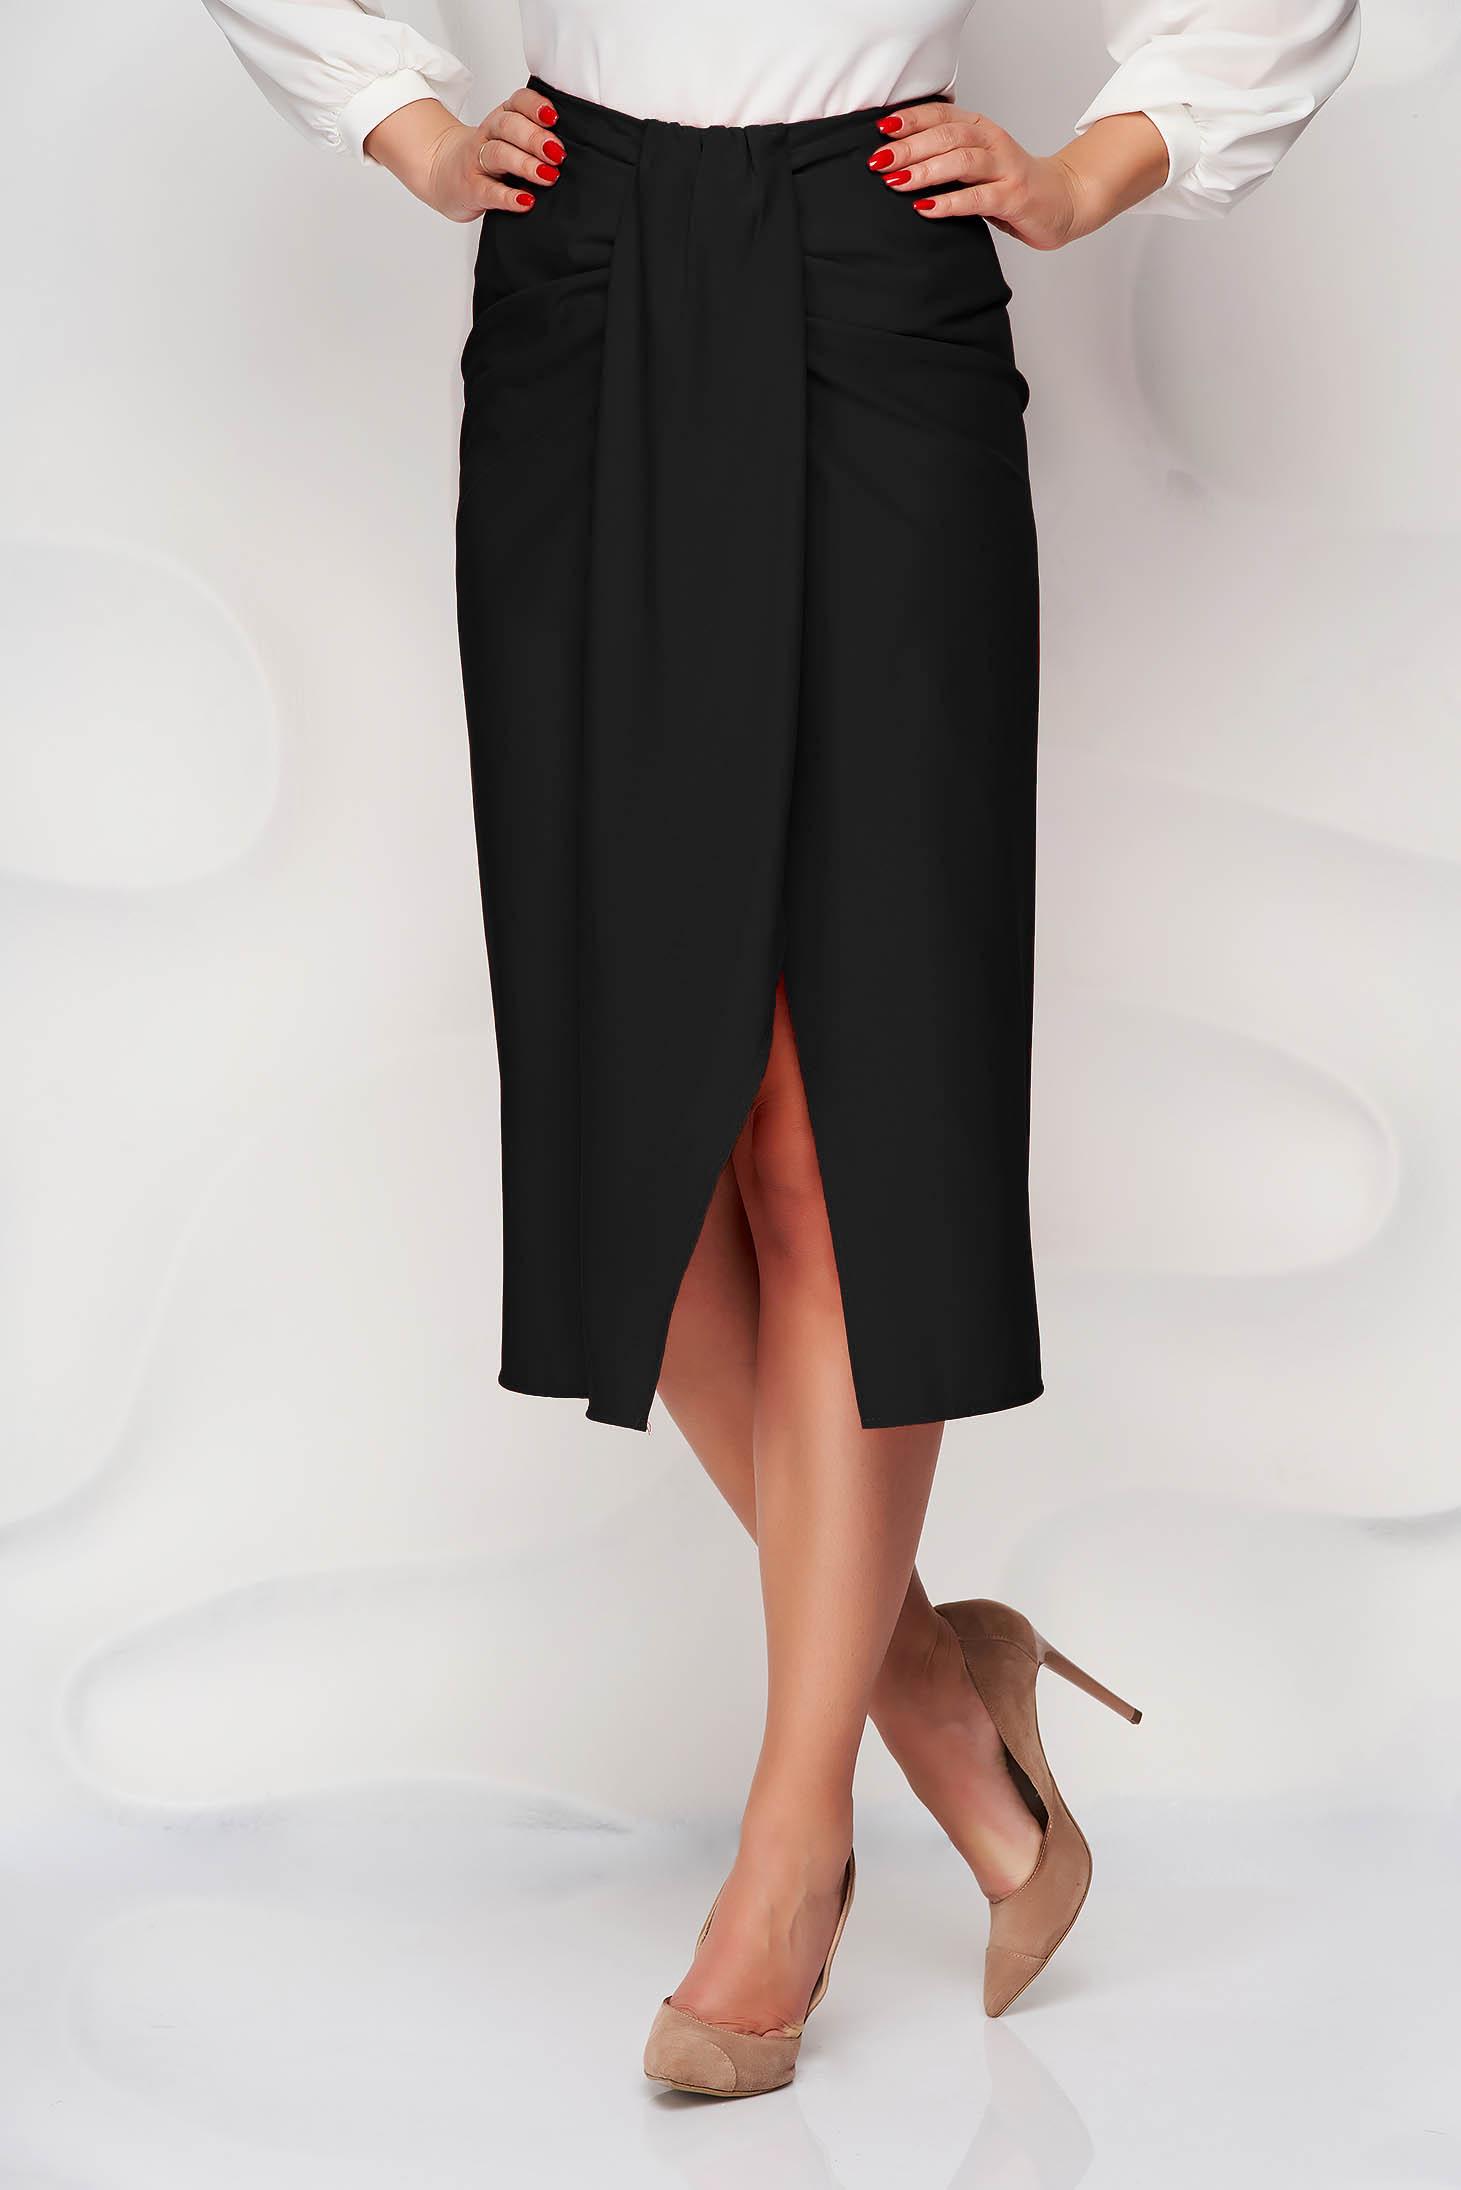 Black skirt pencil slit nonelastic fabric